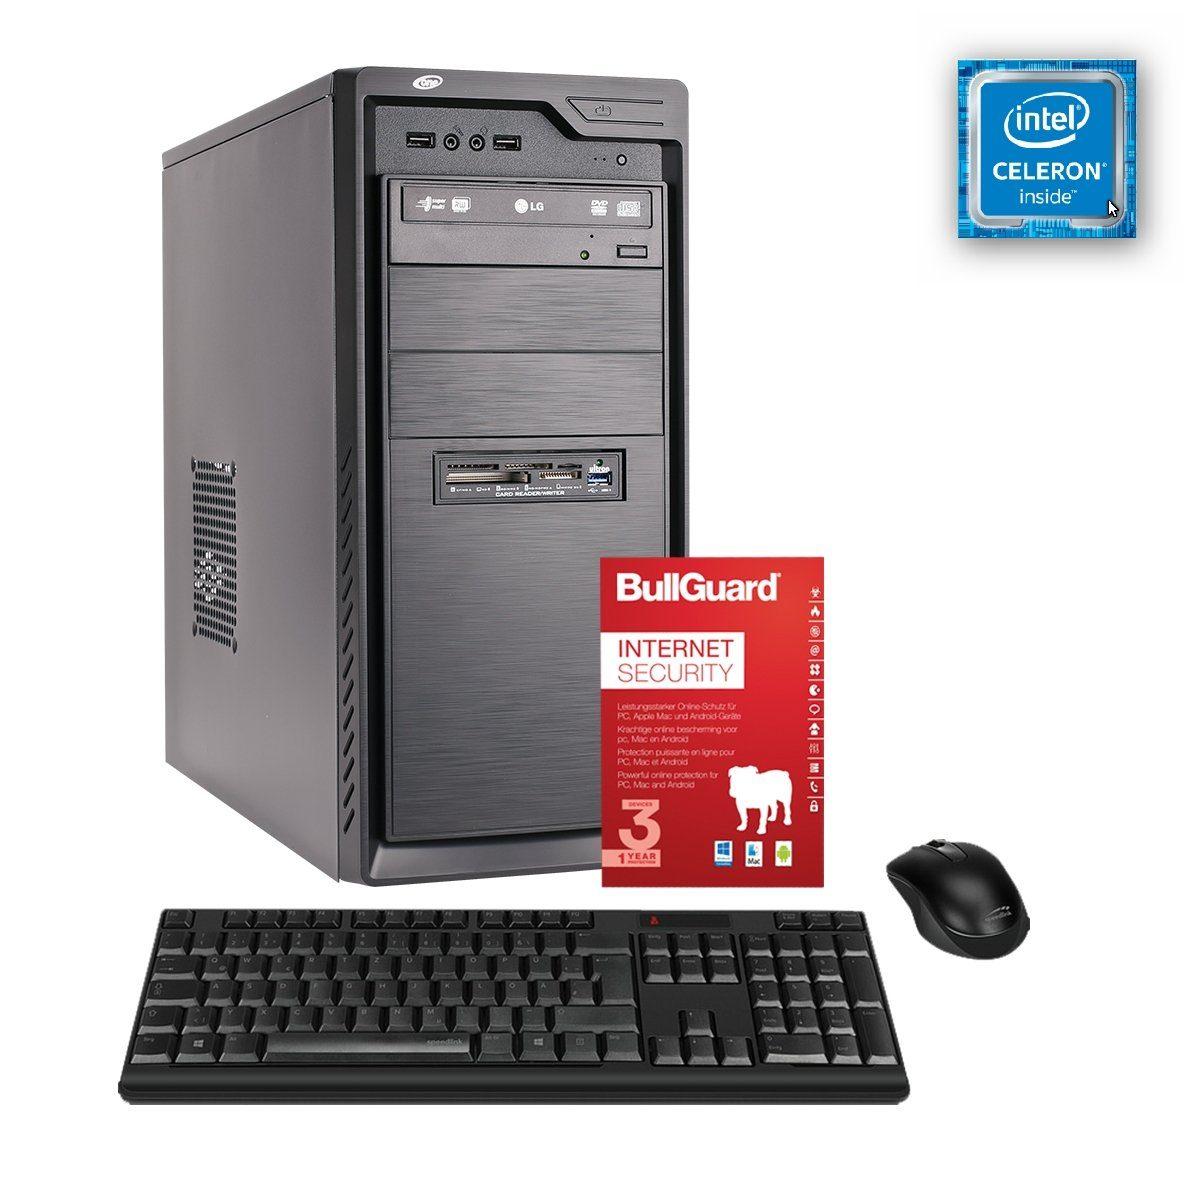 ONE PC, Celeron G4900, UHD Graphics 610, 4GB DDR4 RAM »PC 44064«